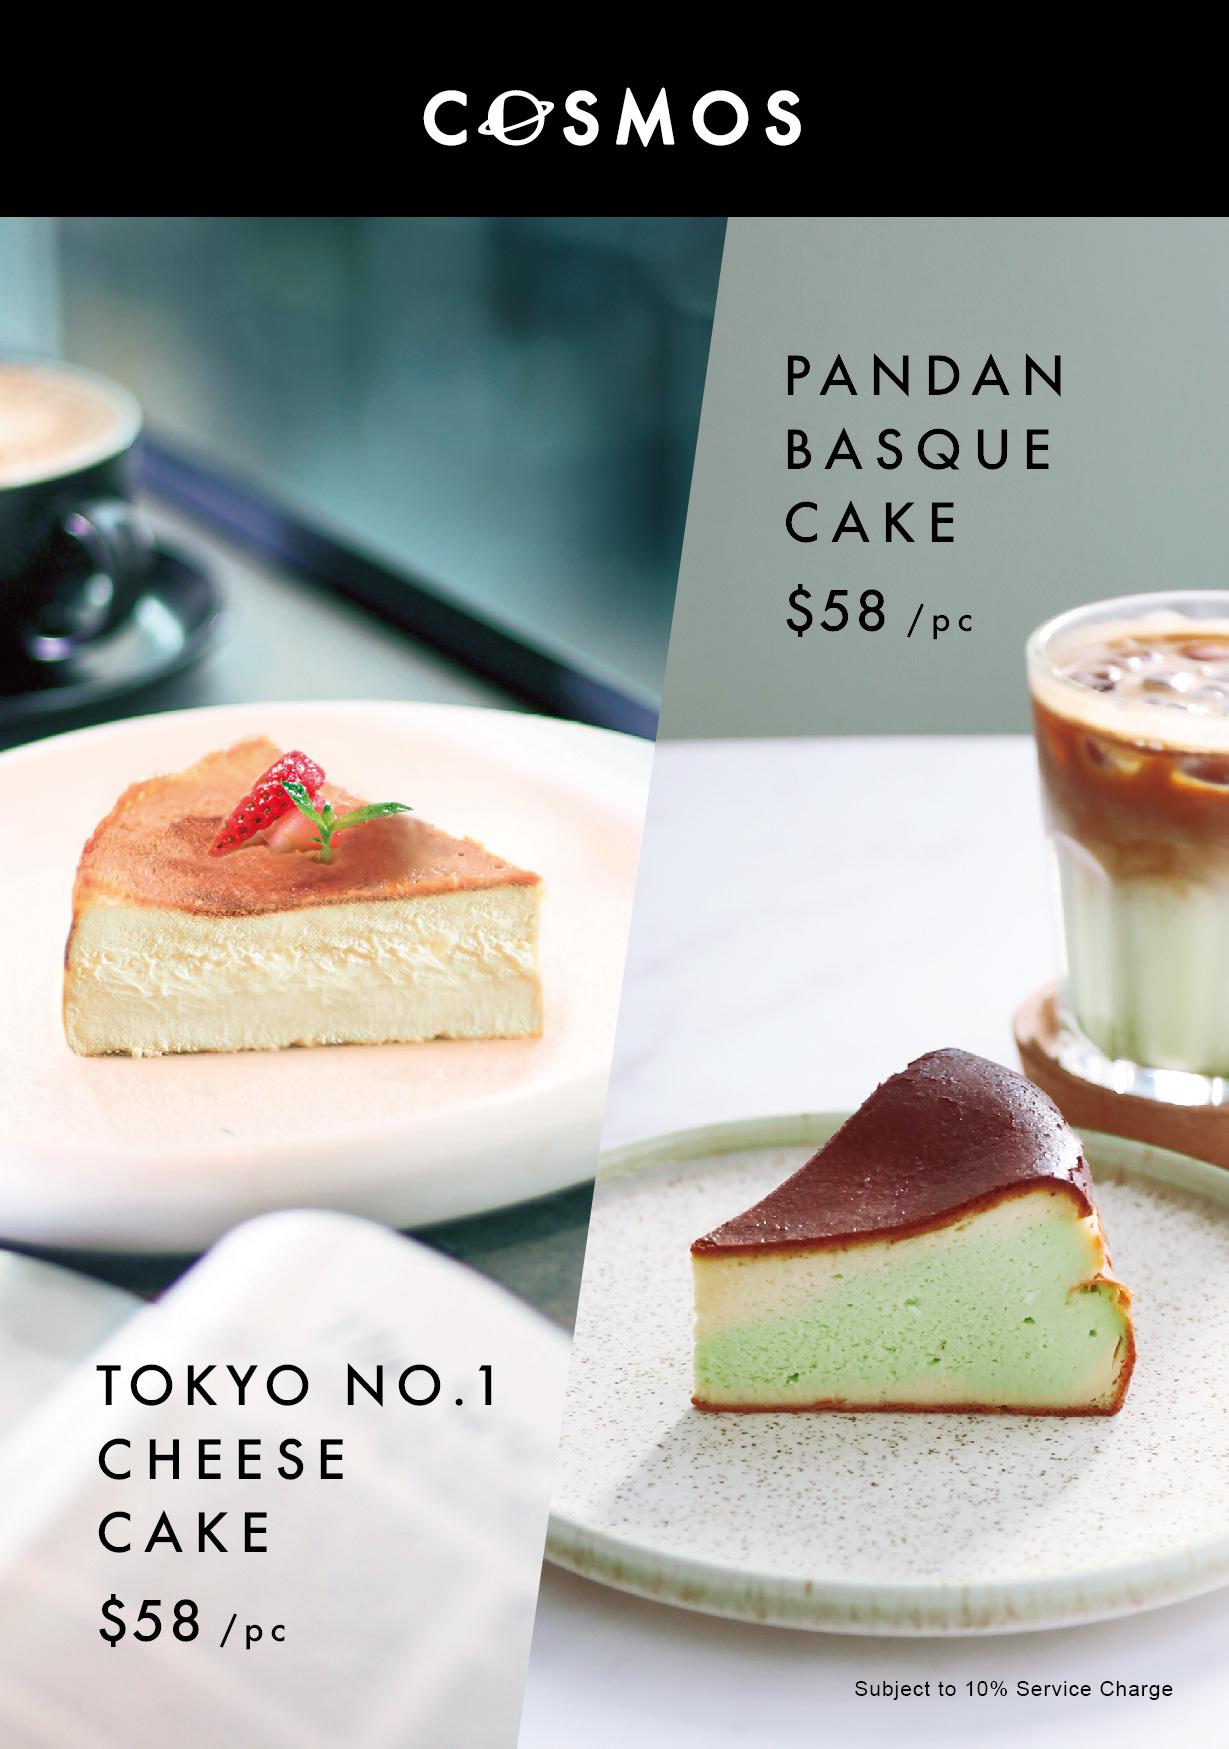 Tokyo No.1 Cheese Cake x Pandan Basque Cake